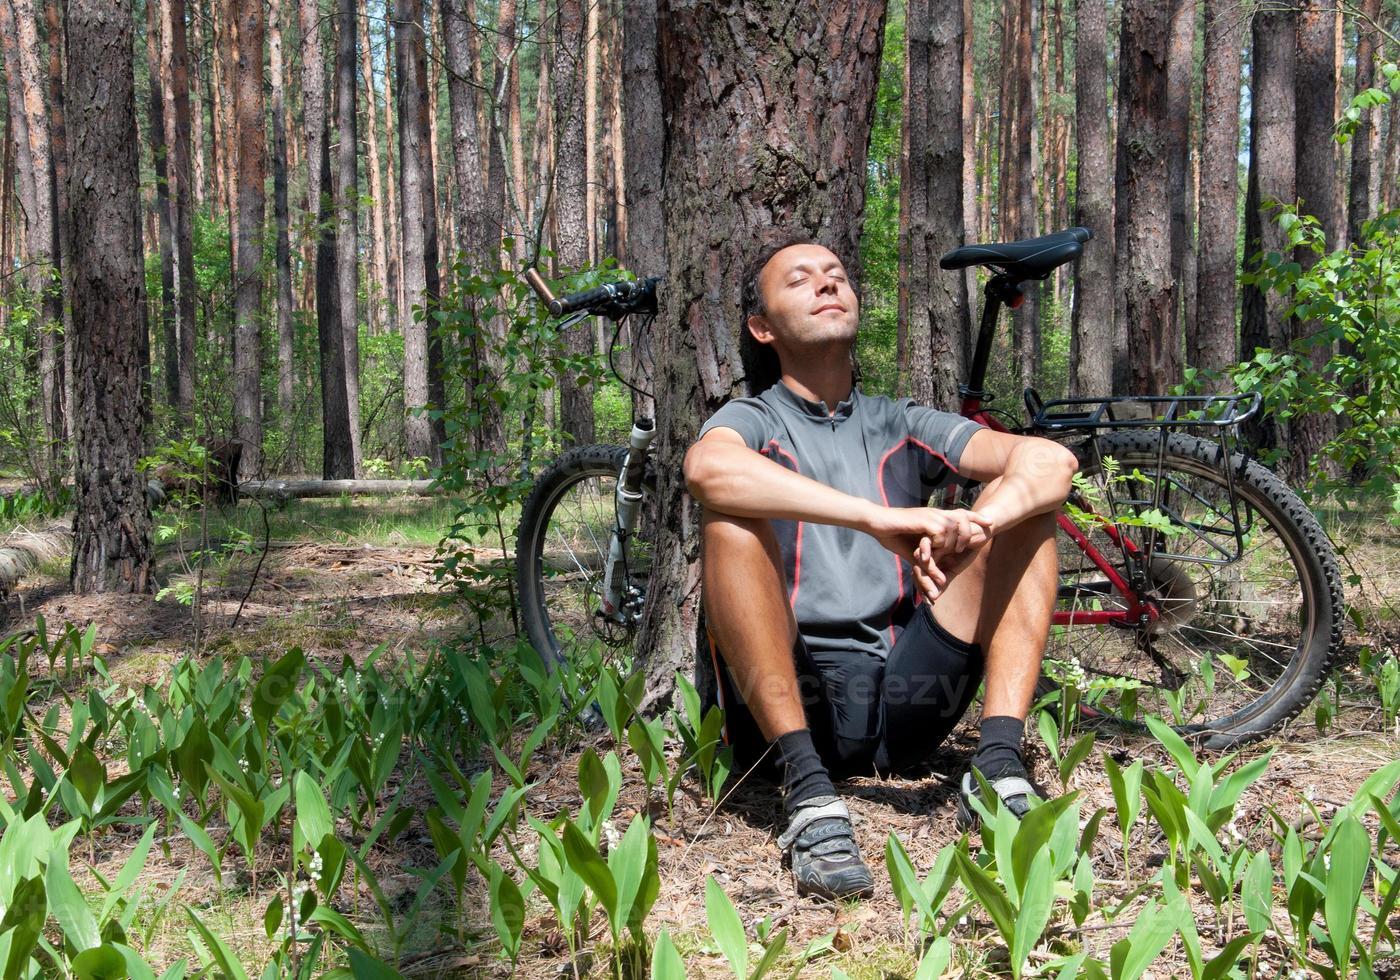 ontspannende fietser in naaldbos de lente onder pijnboom foto